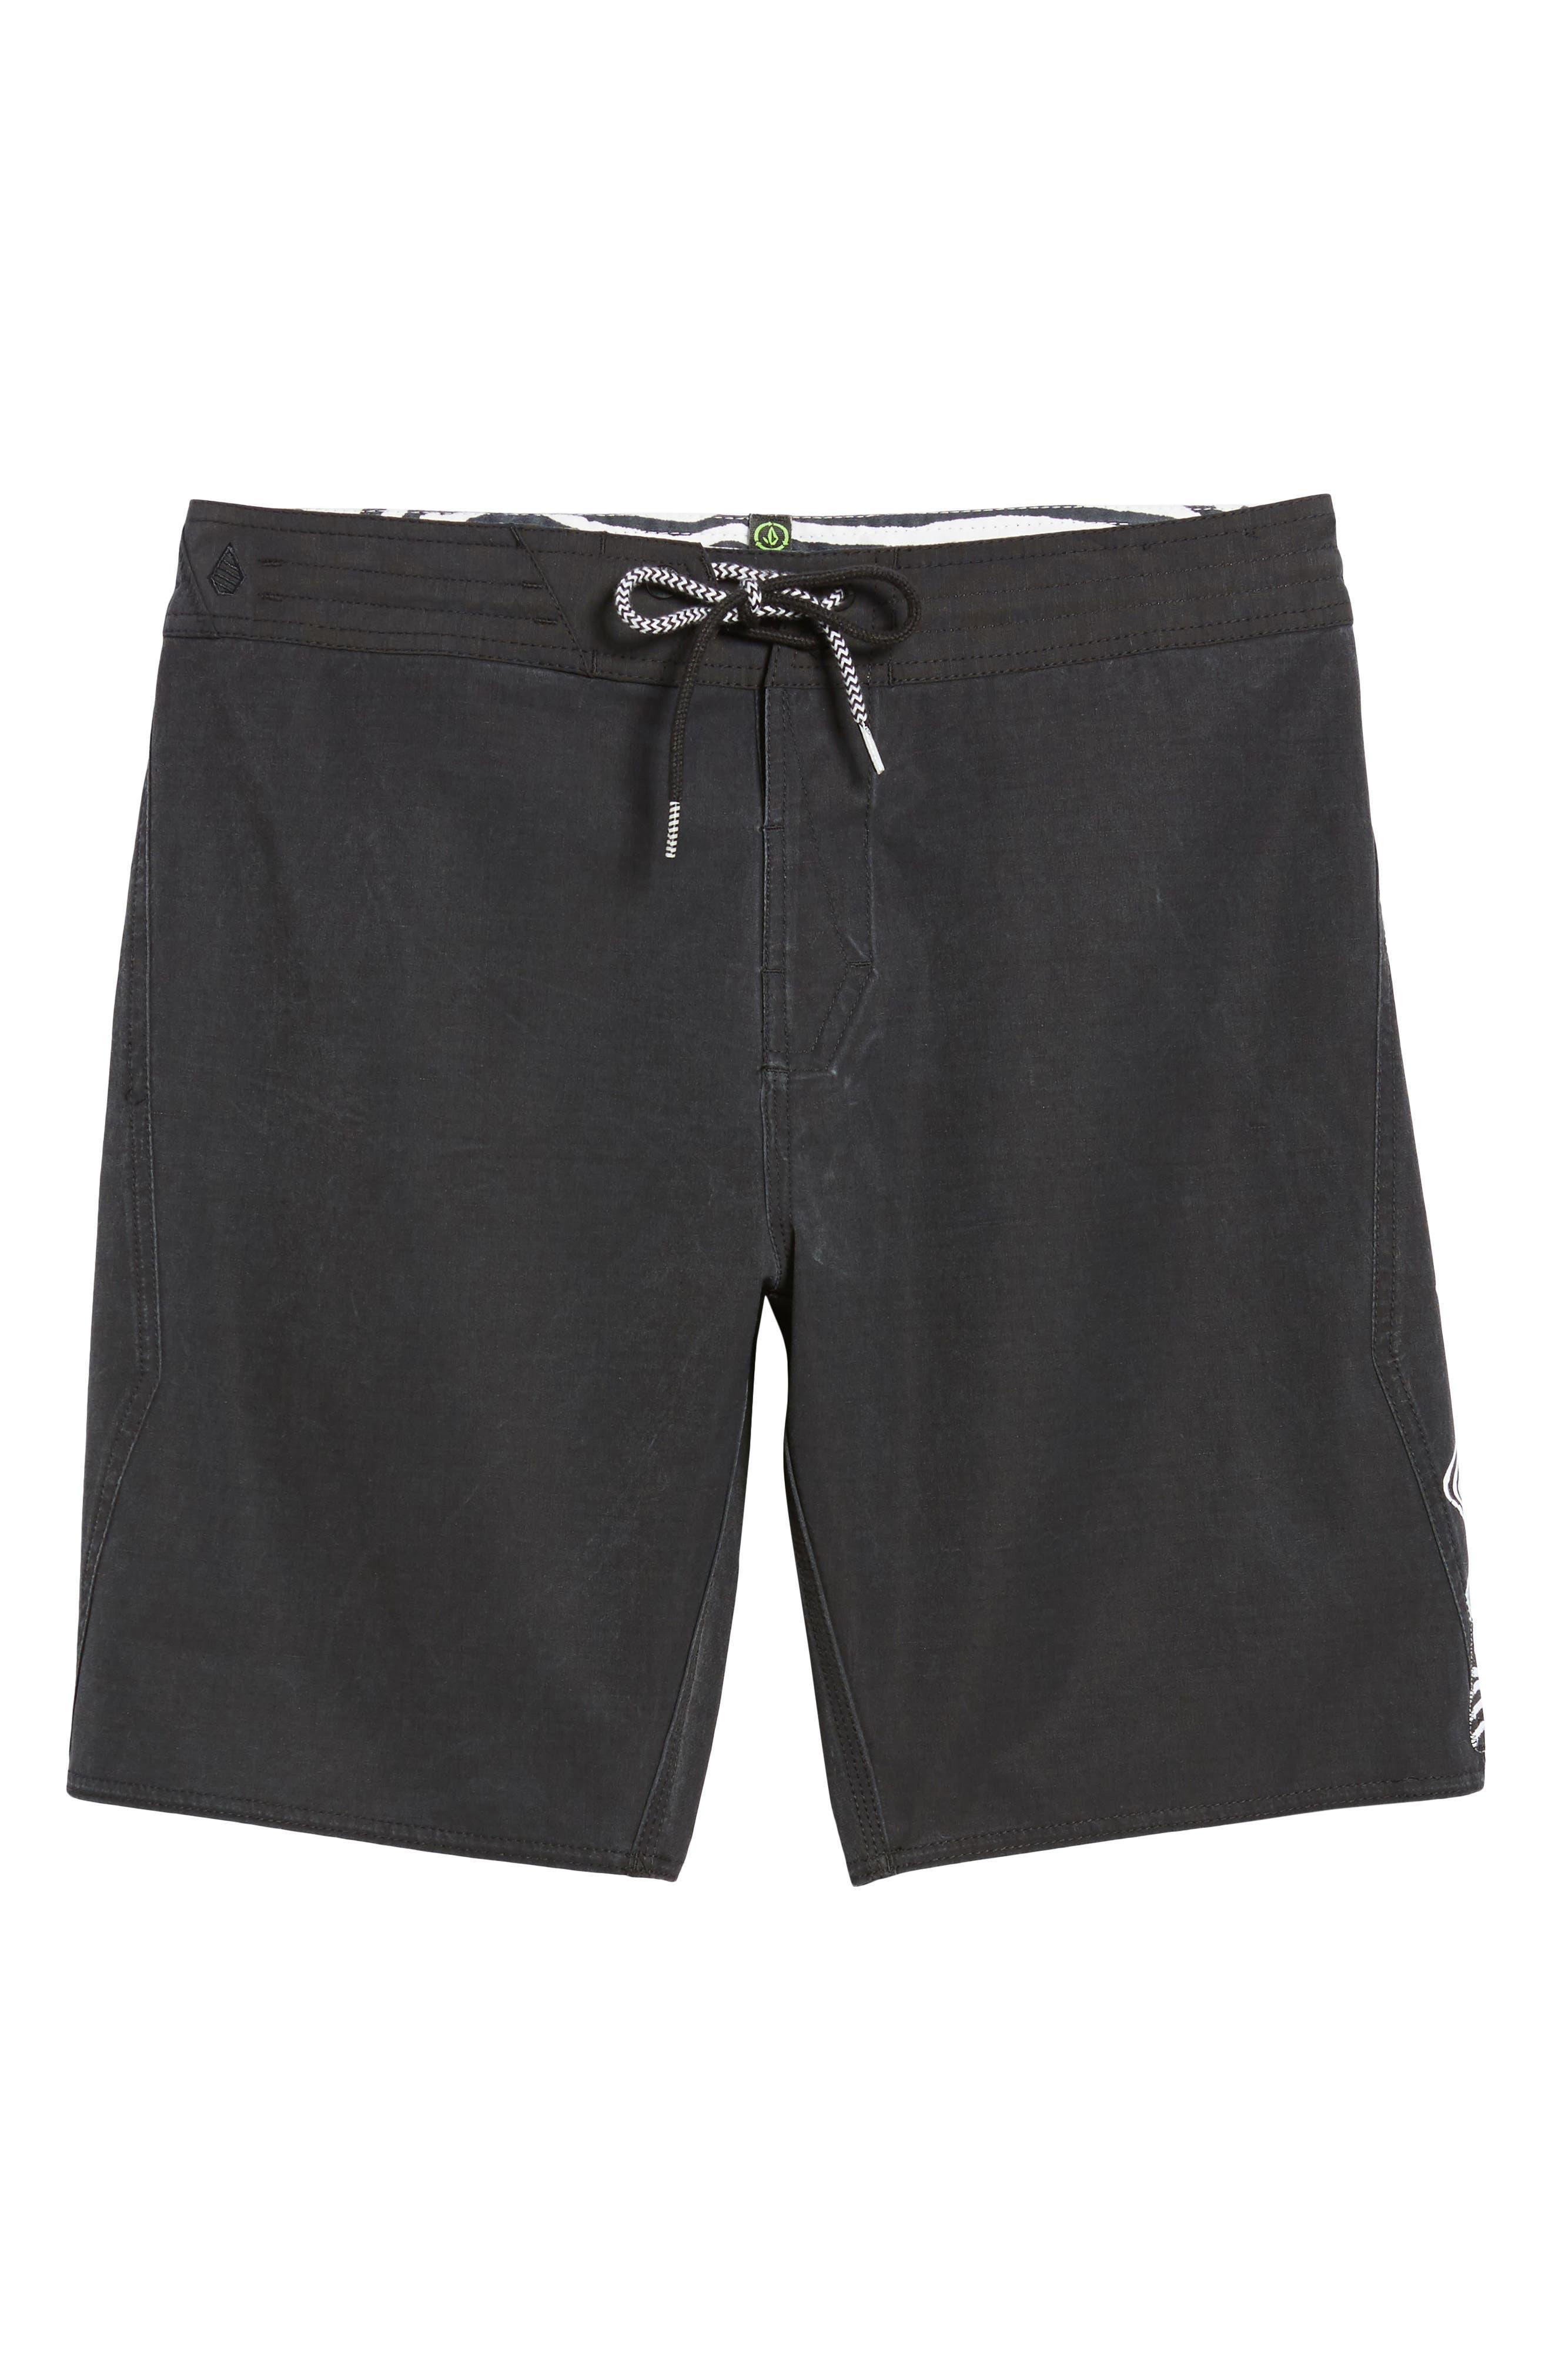 Side Fi Stoney Board Shorts,                             Alternate thumbnail 6, color,                             001